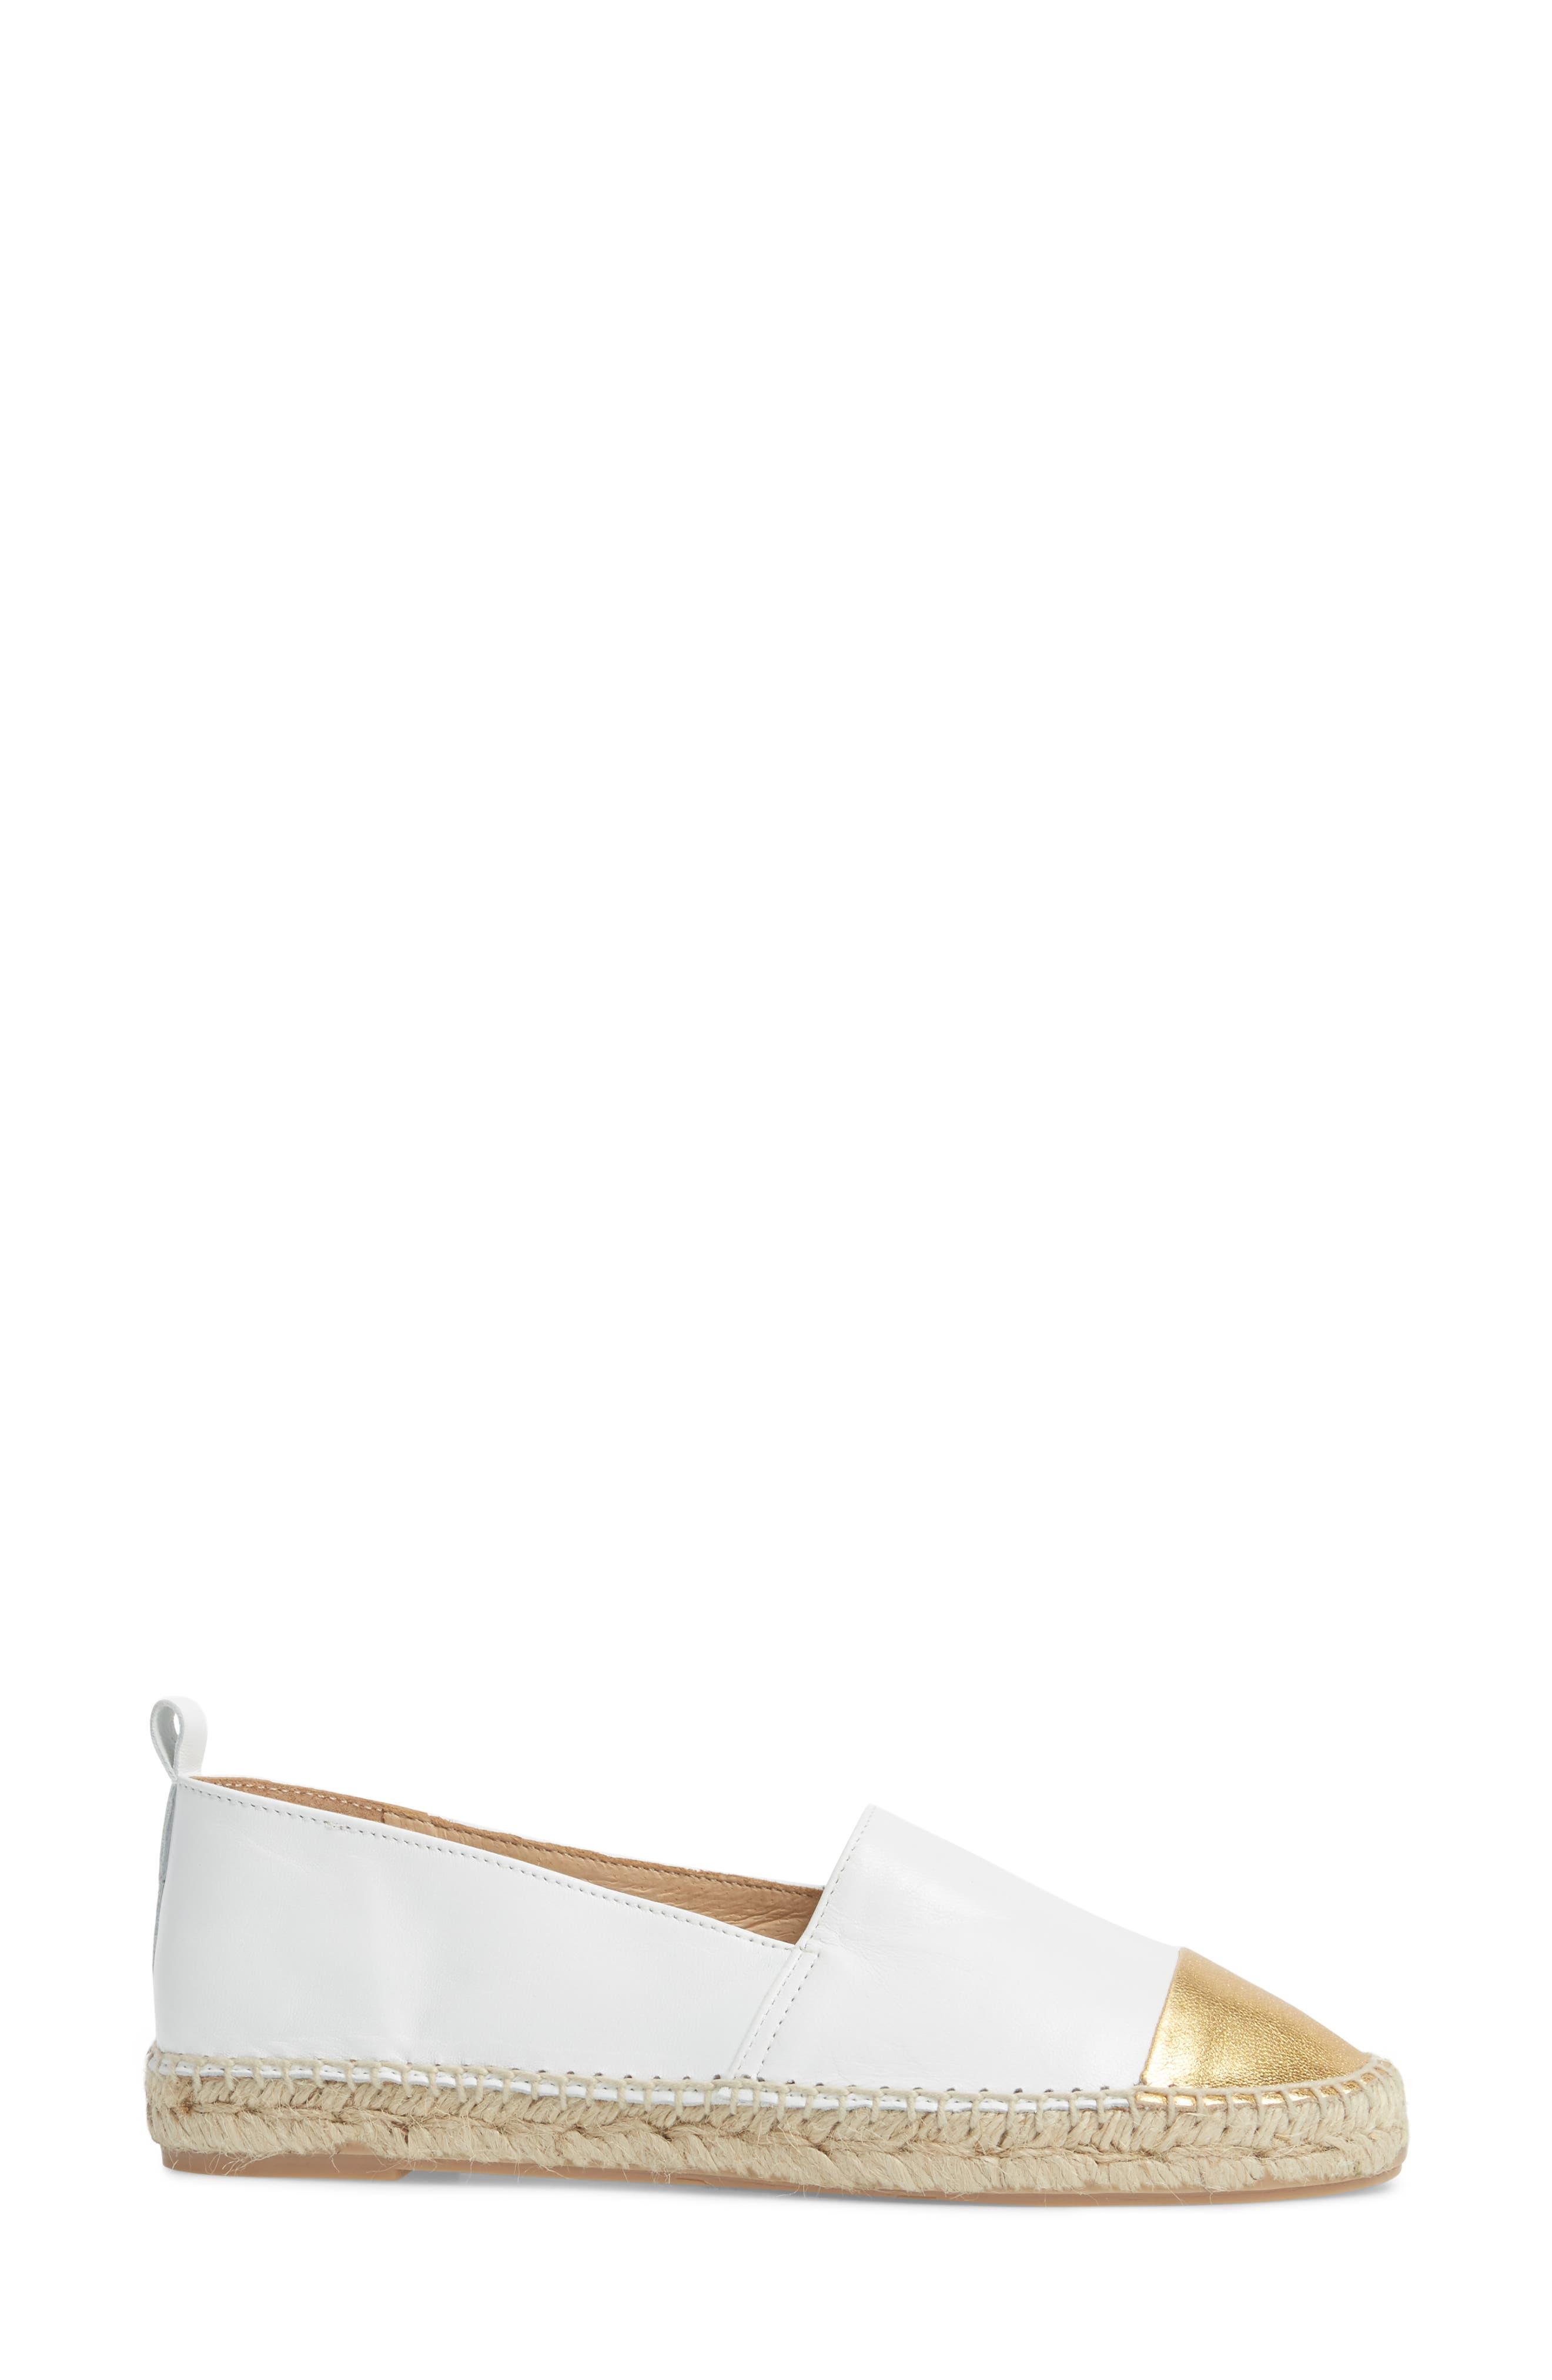 Lynn Cap Toe Espadrille,                             Alternate thumbnail 3, color,                             White/ Gold Leather